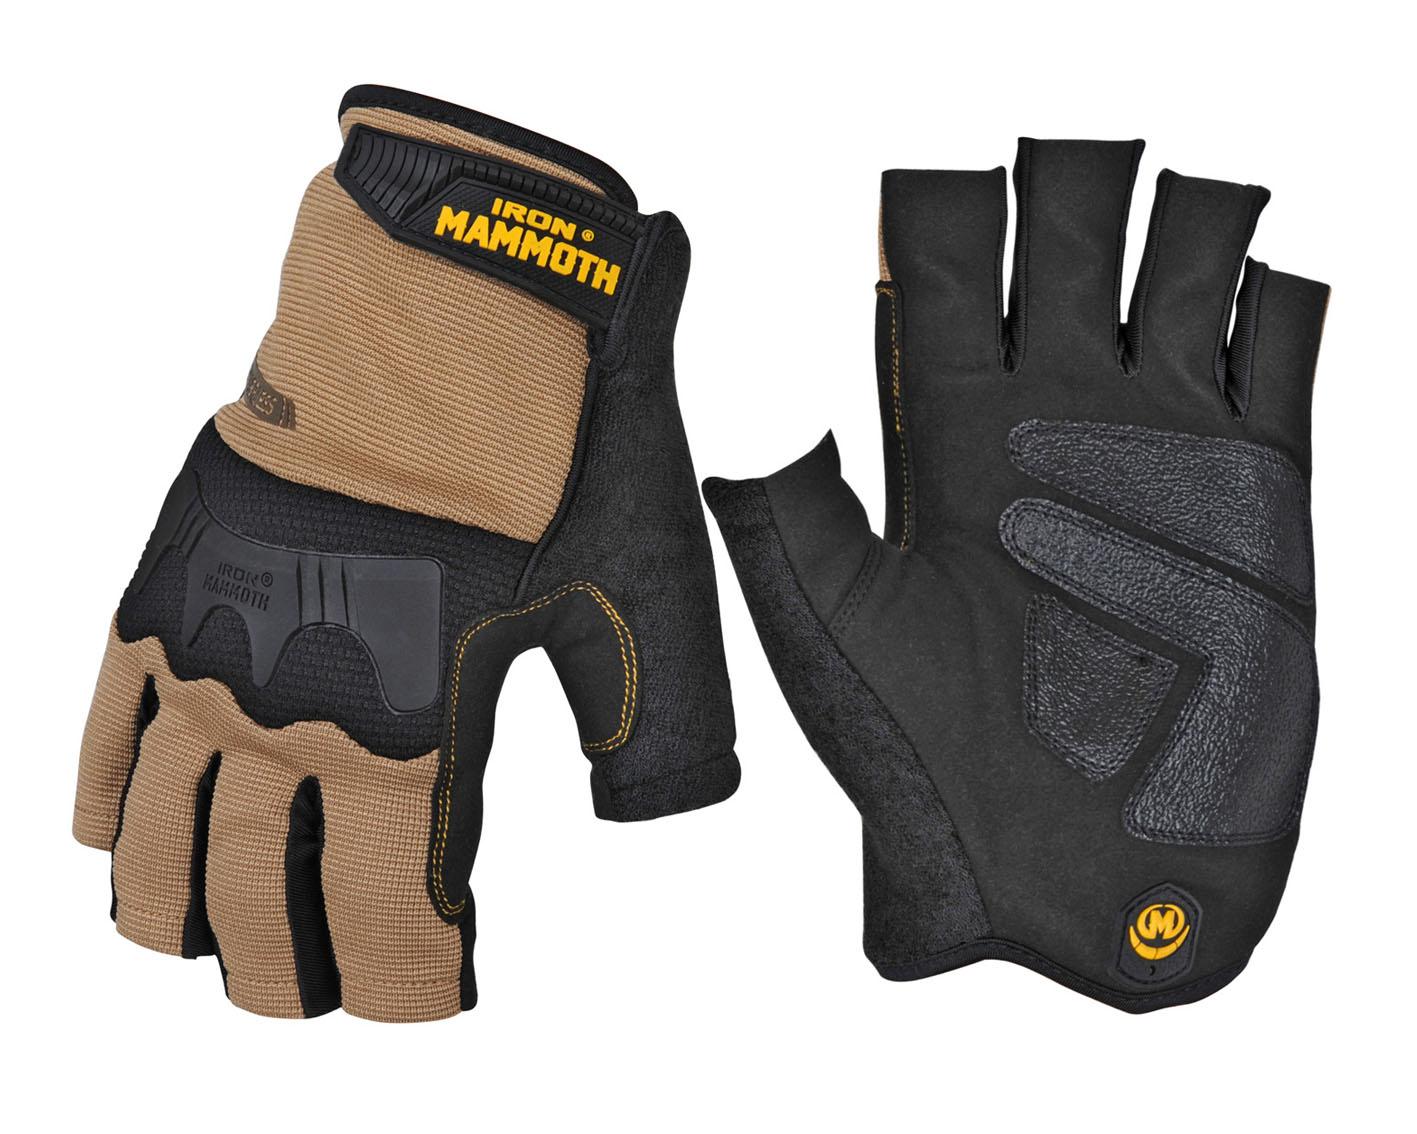 Fingerless Work Glove